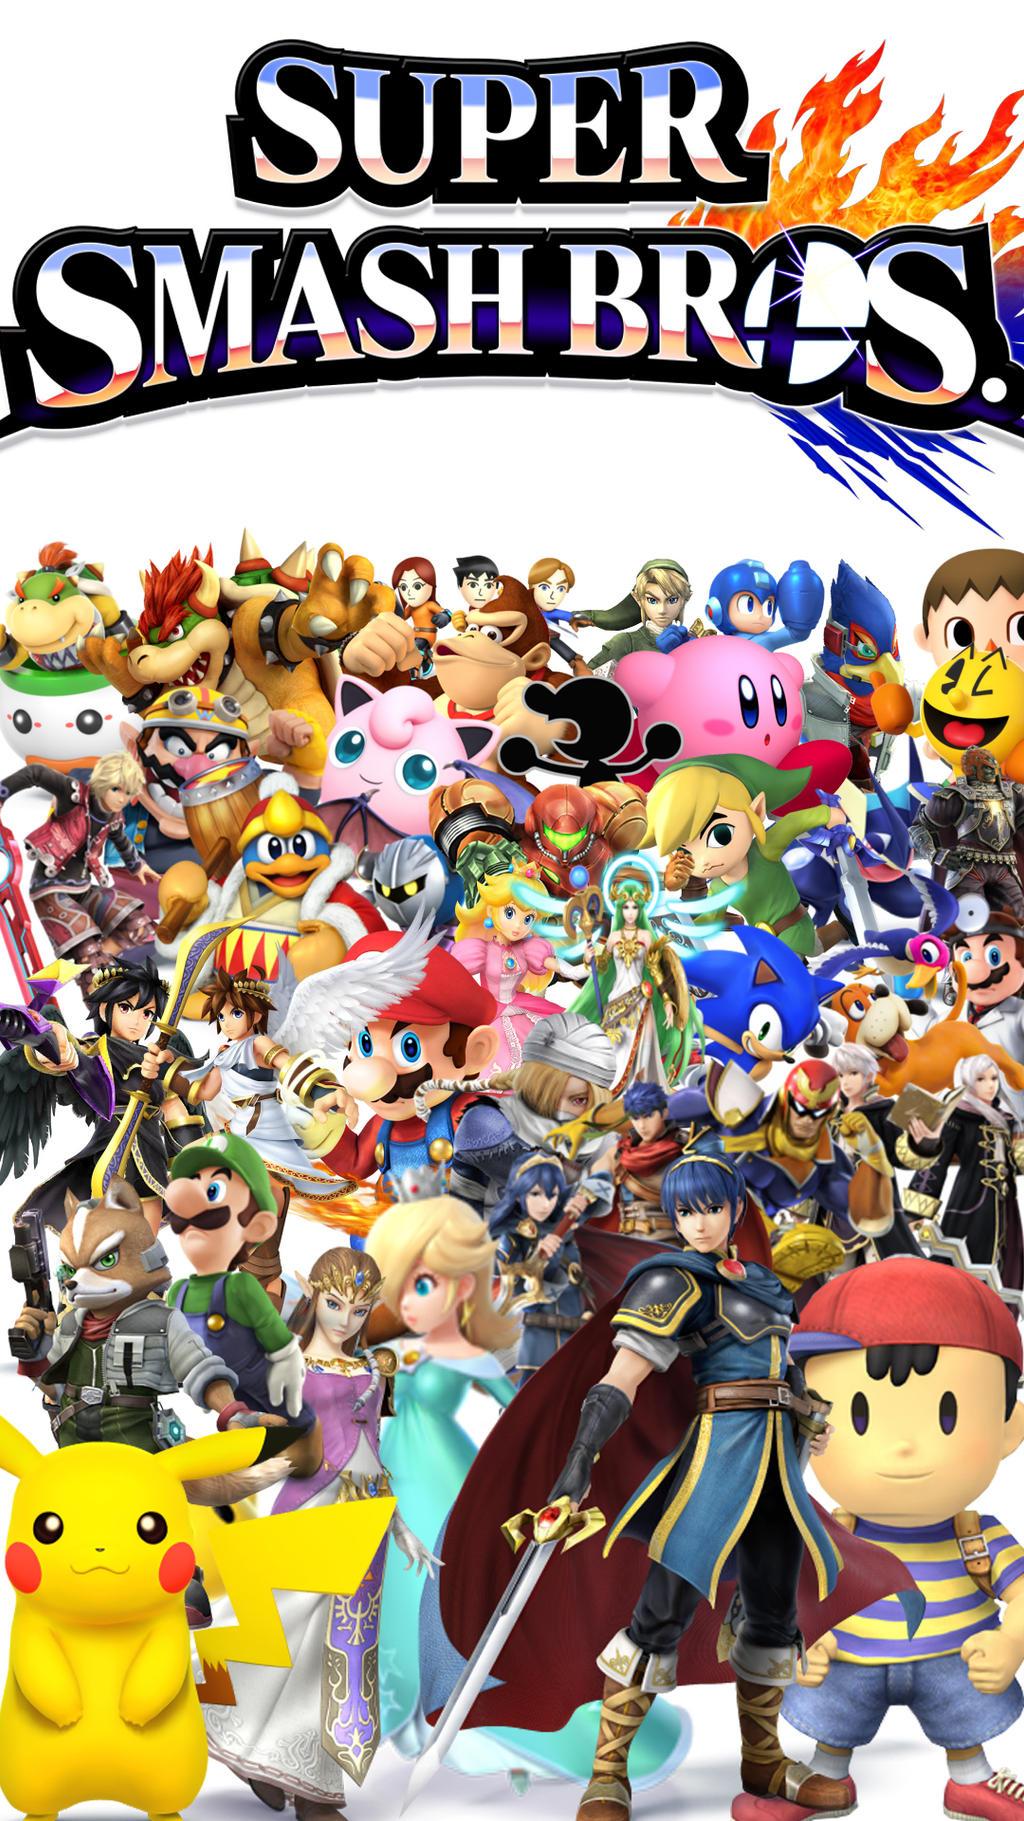 Super Smash Bros 4 Phone Wallpaper By Bestselenana On Deviantart